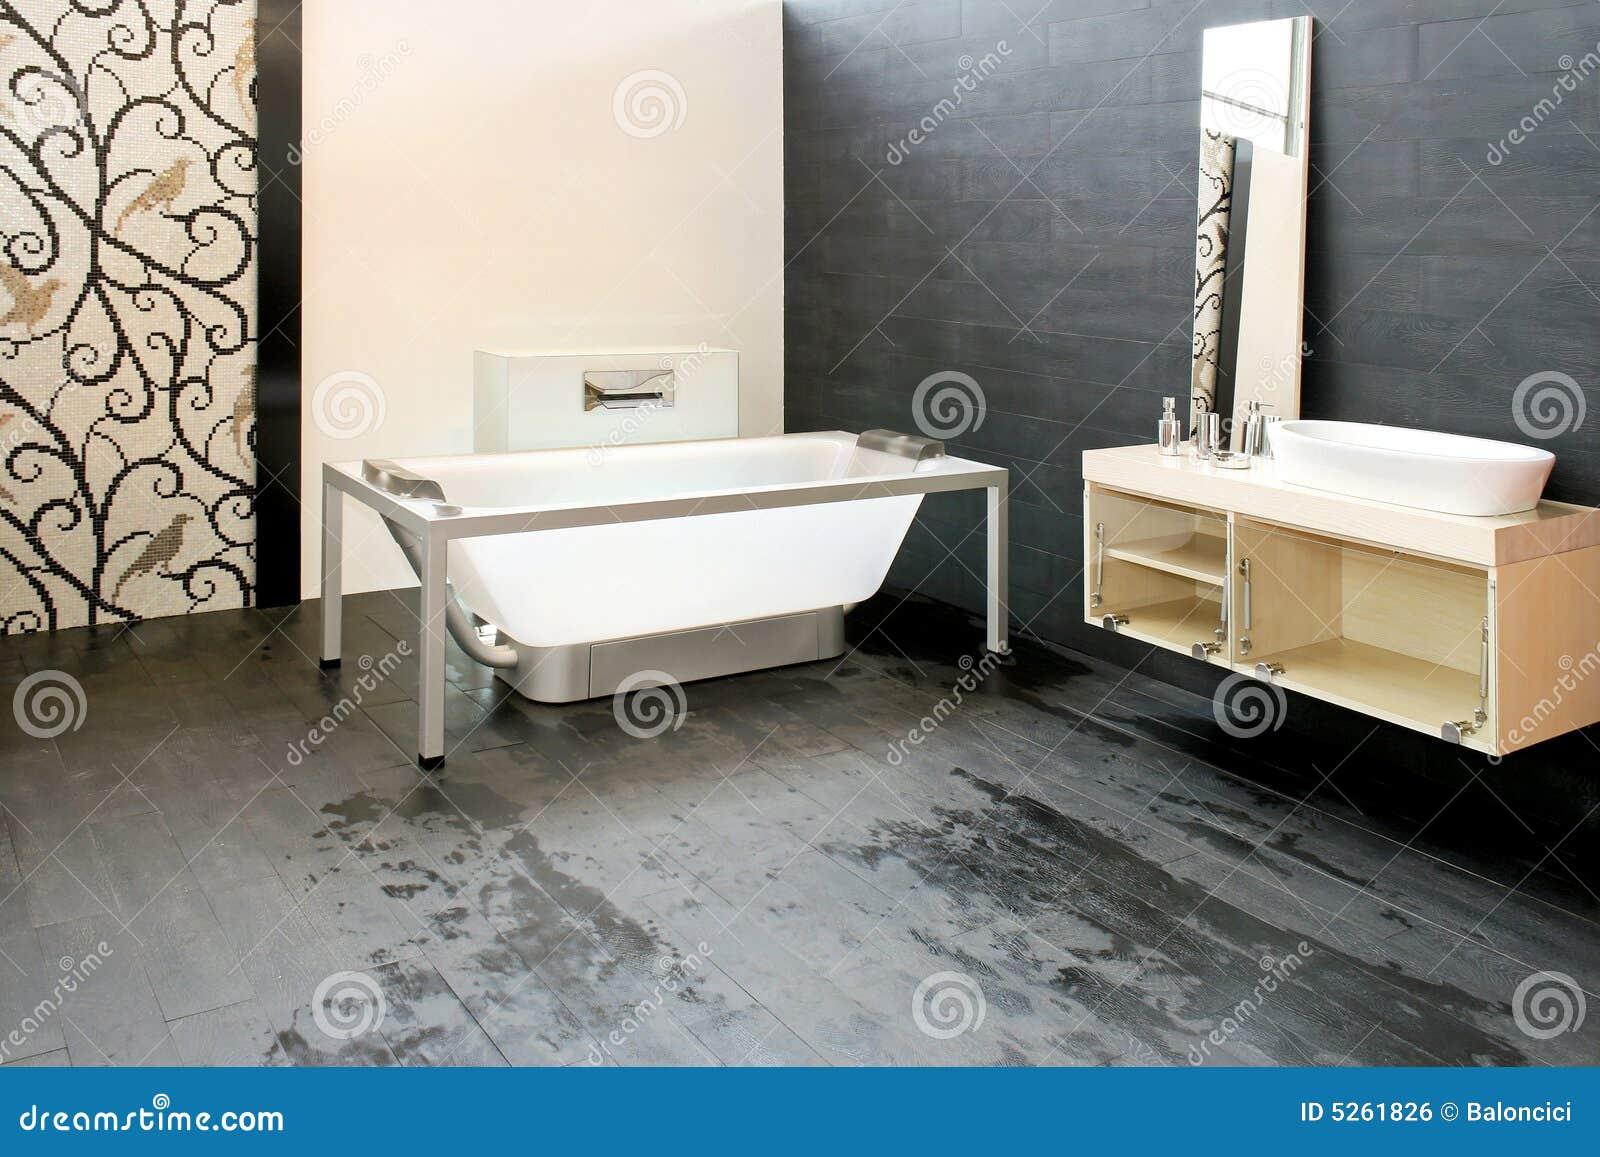 Vasca Da Bagno Libera : Sovrapposizione vasca da bagno